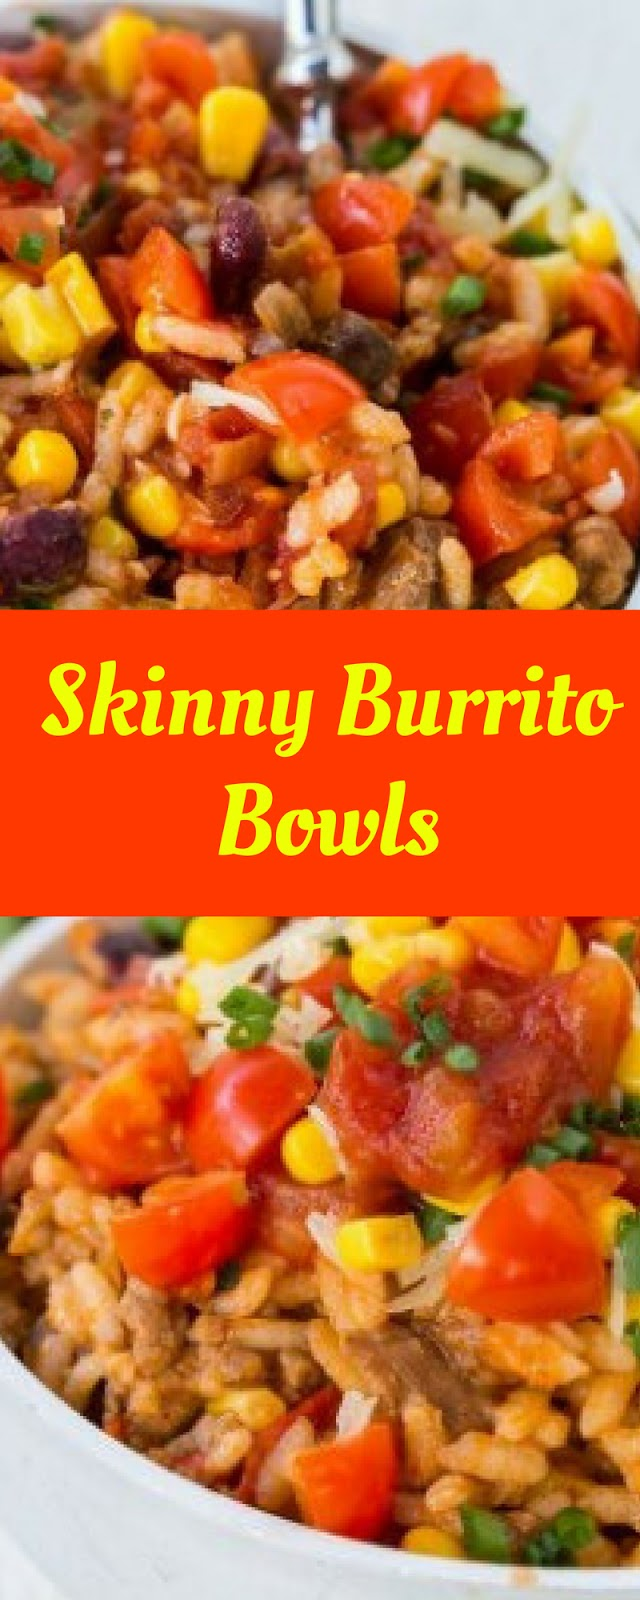 Skinny Burrito Bowls